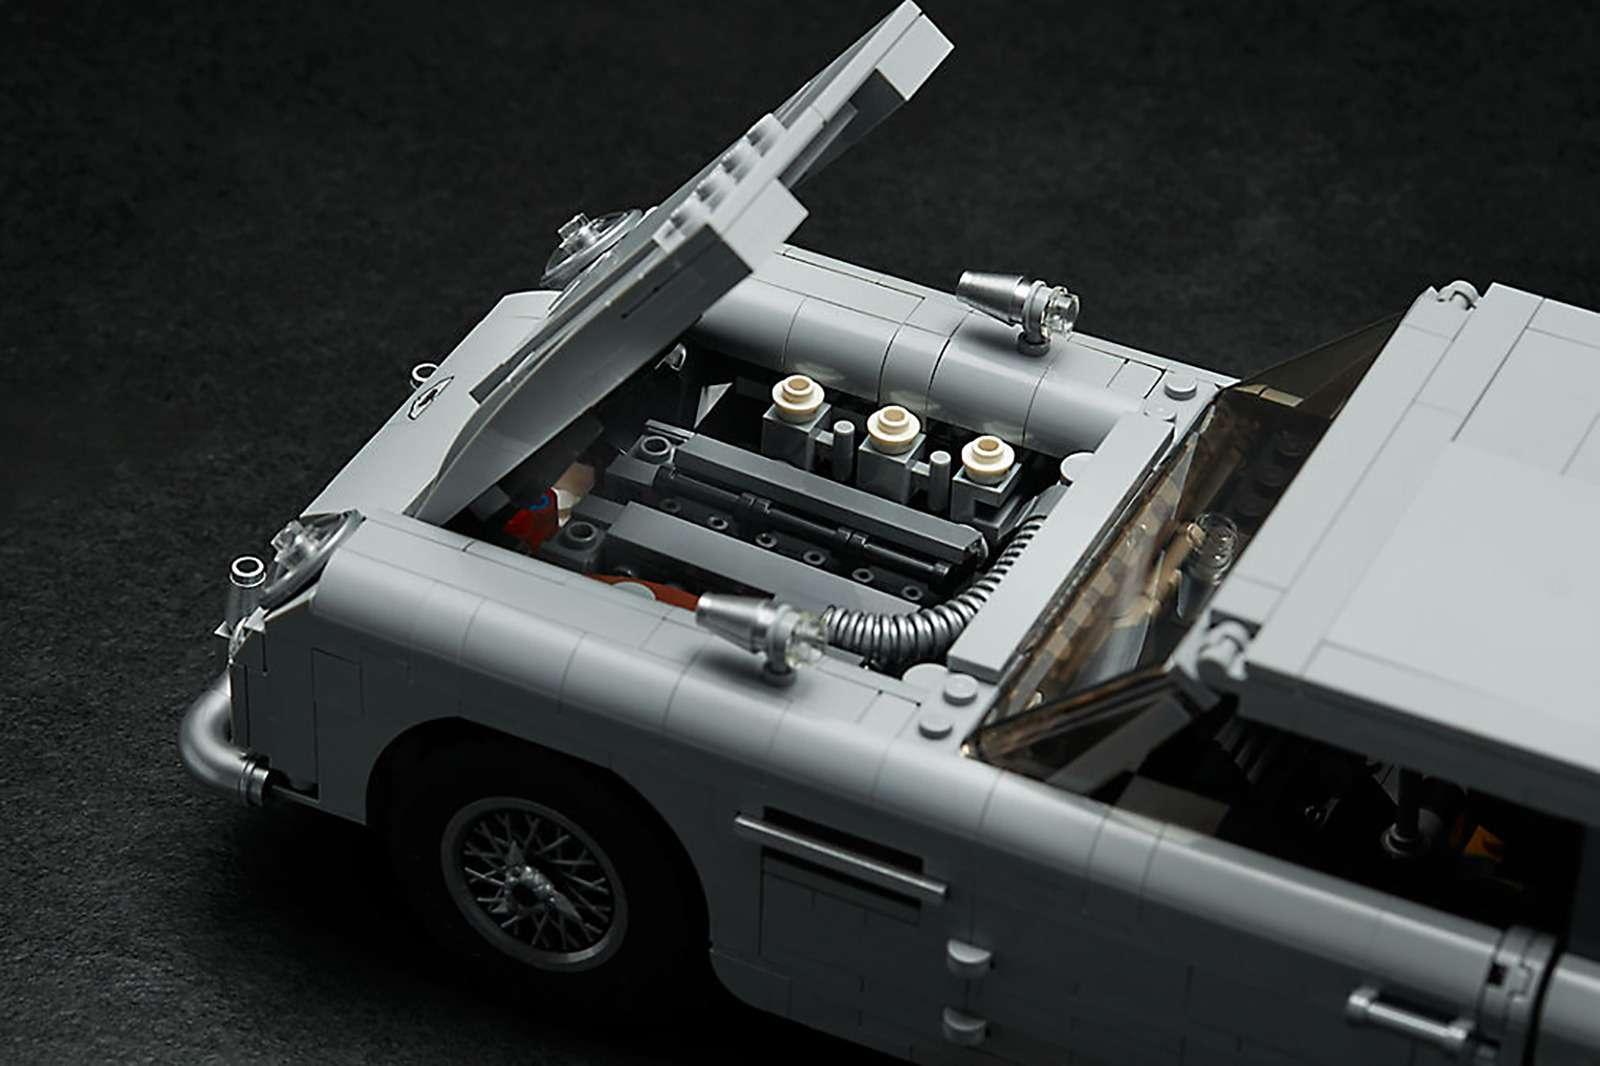 Хочешь машину как у Джеймса Бонда? Собери ее сам! — фото 888208